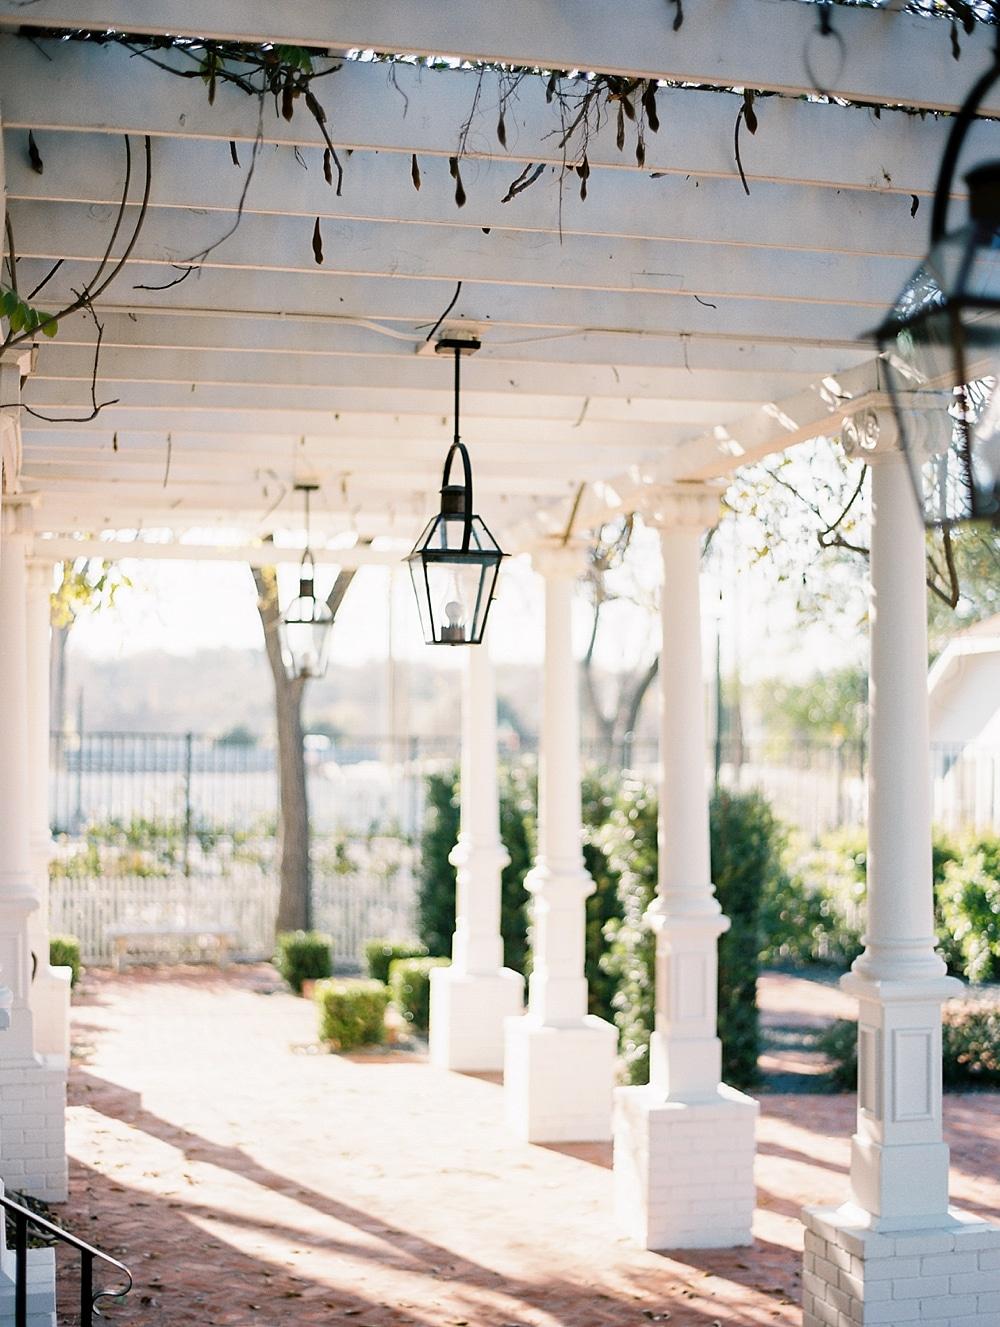 kristin-la-voie-photography-austin-wedding-photographer-woodbine-mansion-128